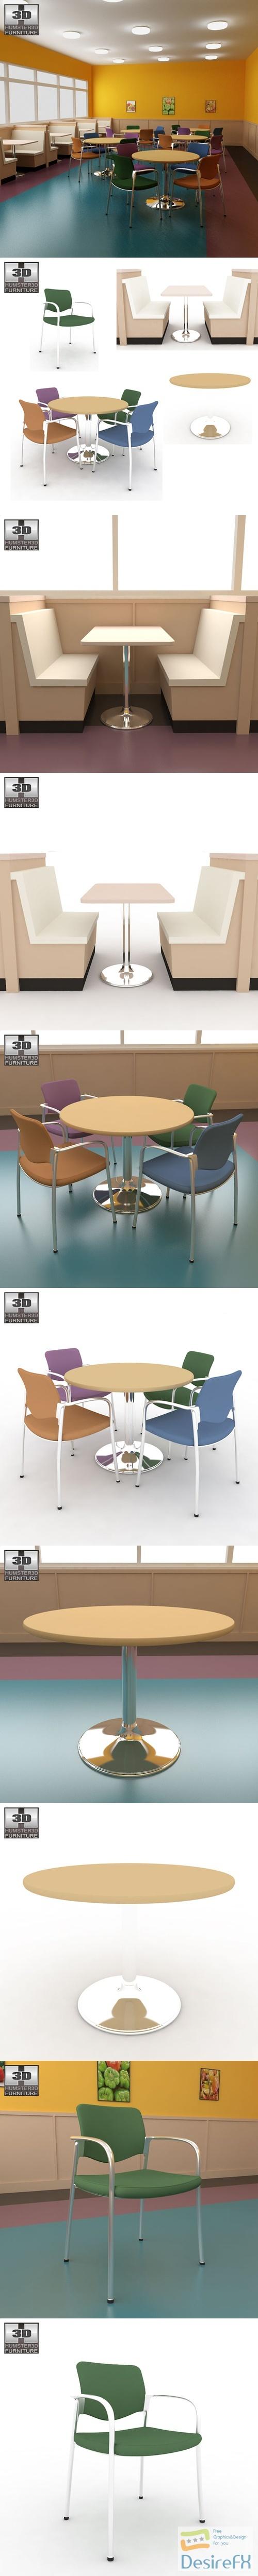 Dining room 04 Set 3D Model